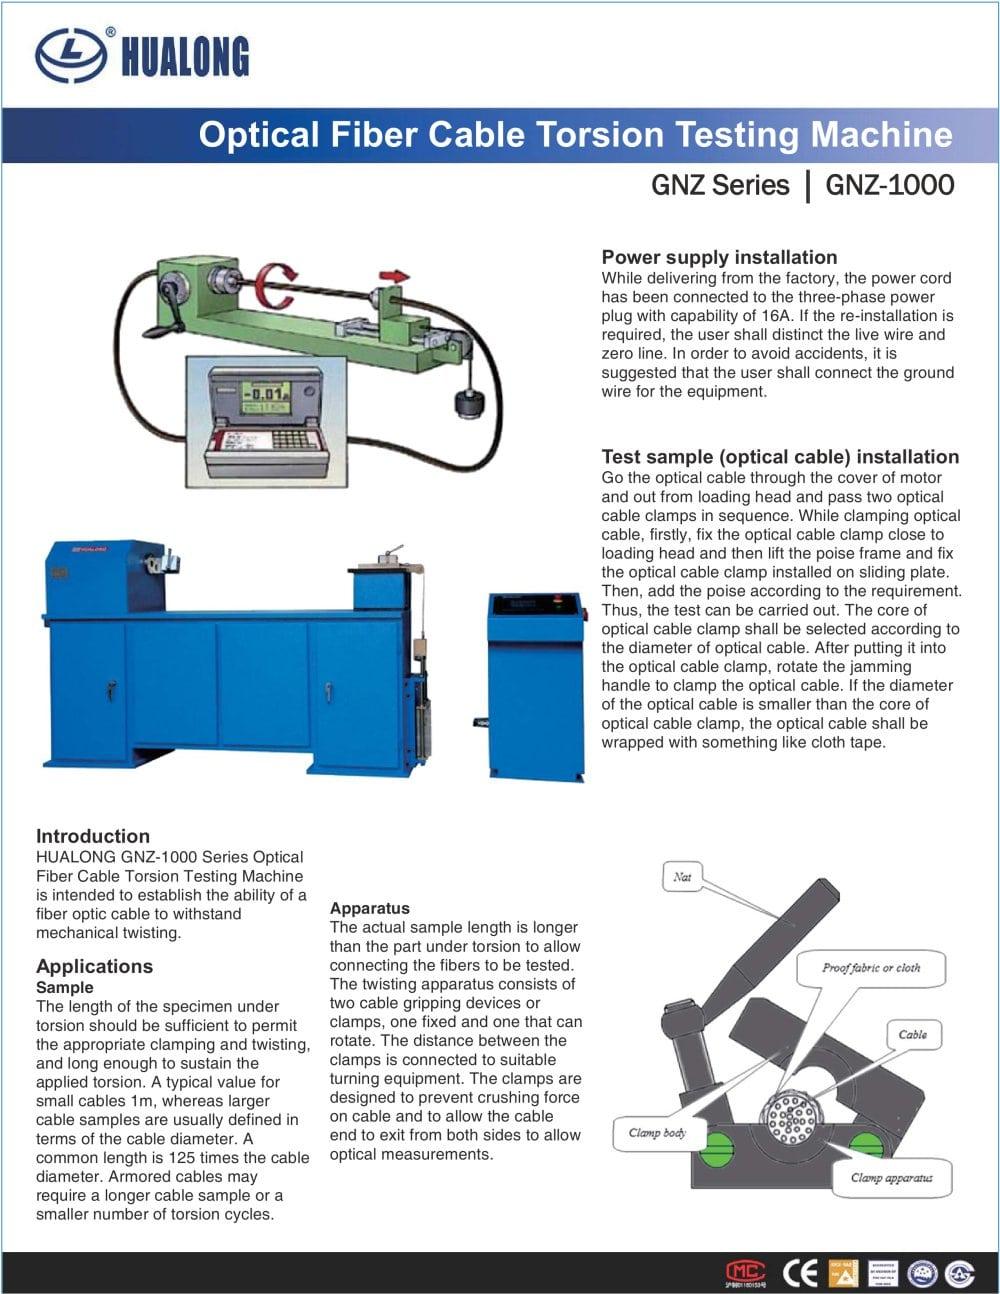 HUALONG|Torsion Testing Machine|GNZ-1000|Optical Fiber Cable ...